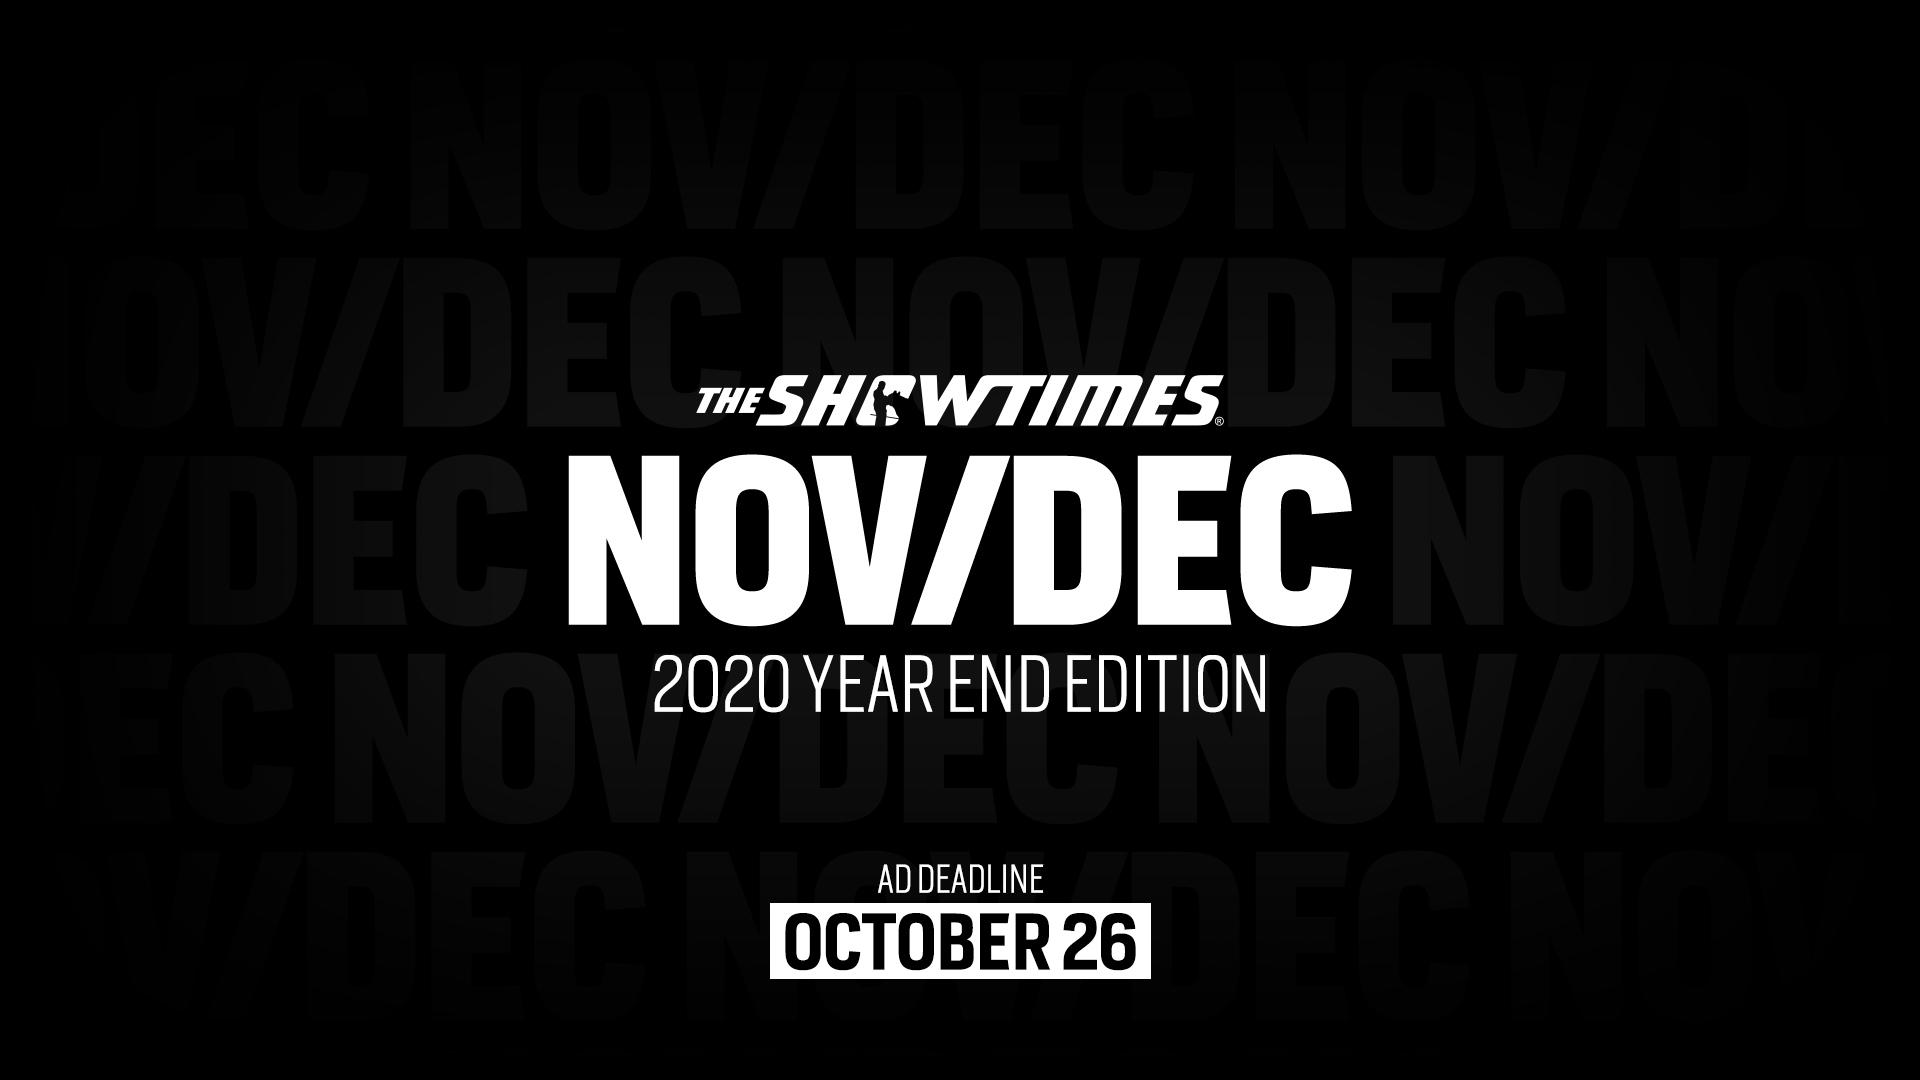 Next Issue Nov/Dec 2020